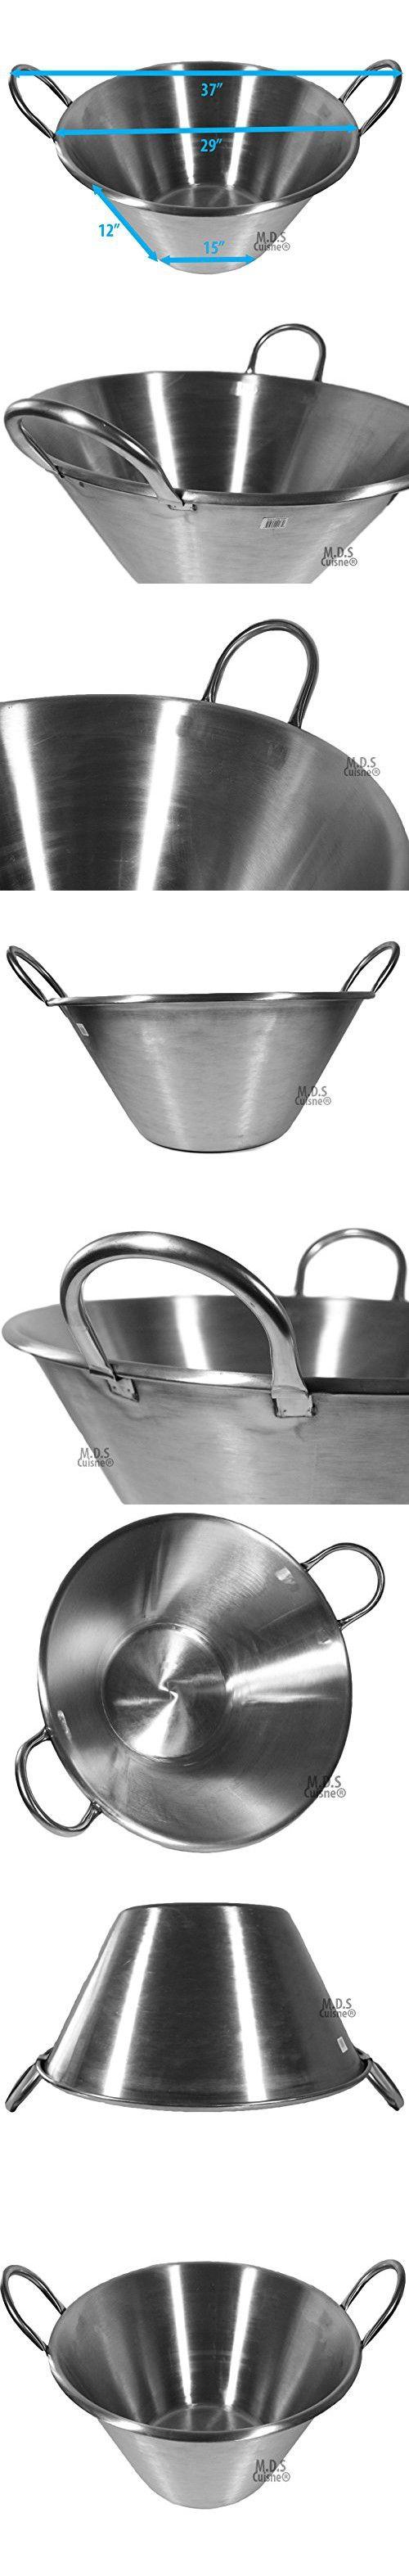 "XXL Cazo Stainless Steel 29""Inch Caso para Carnitas Heavy Duty Wok Acero NEW"